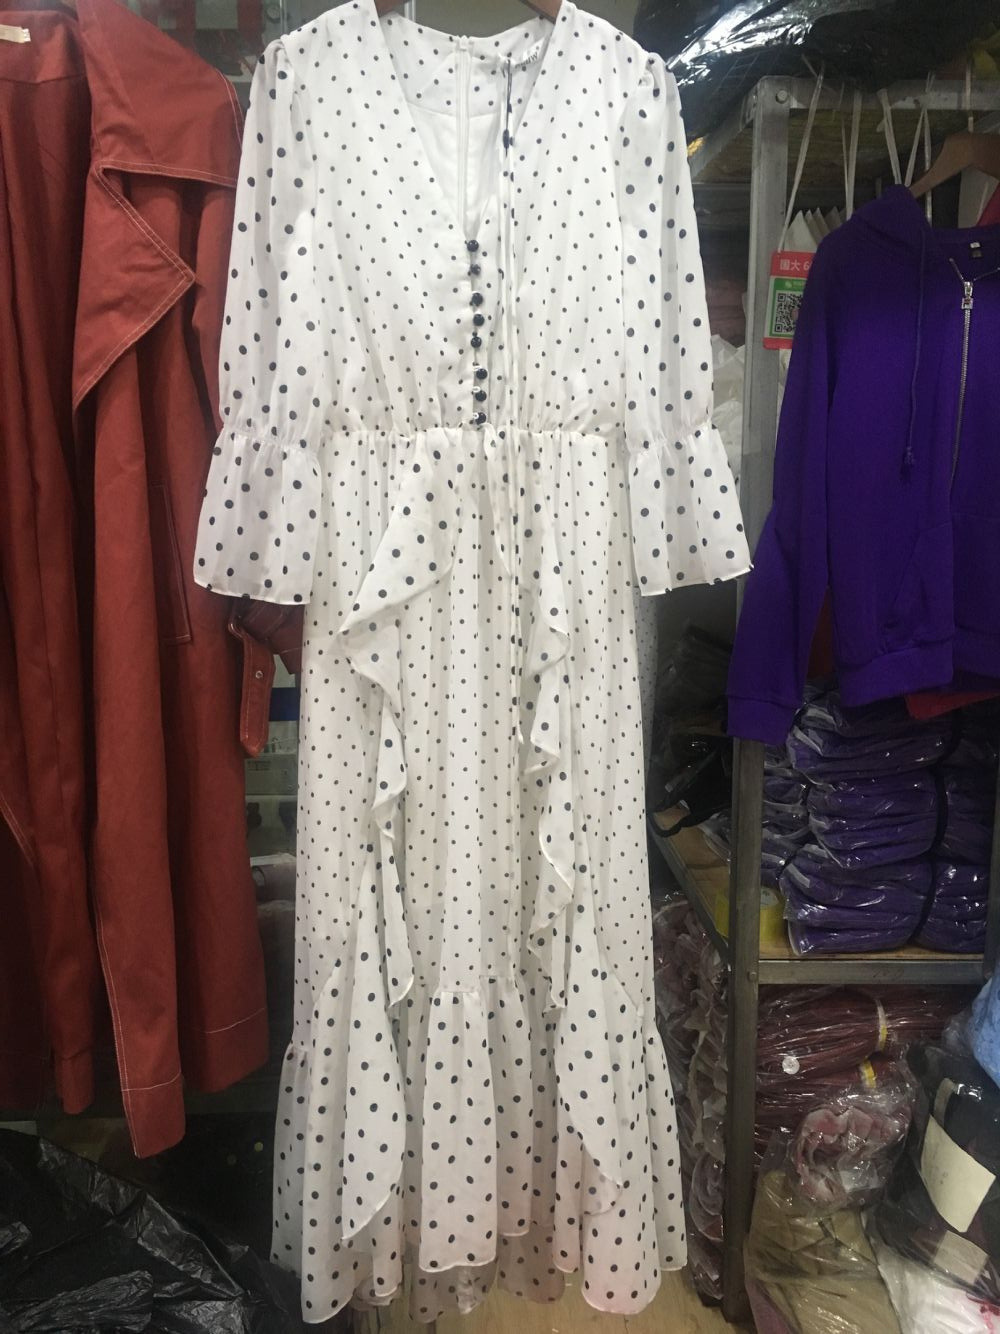 Printemps 2019 nouvelle vague Point robe avec taille haute avant court dos longue mode col en v robe col en v Dot robe femmes